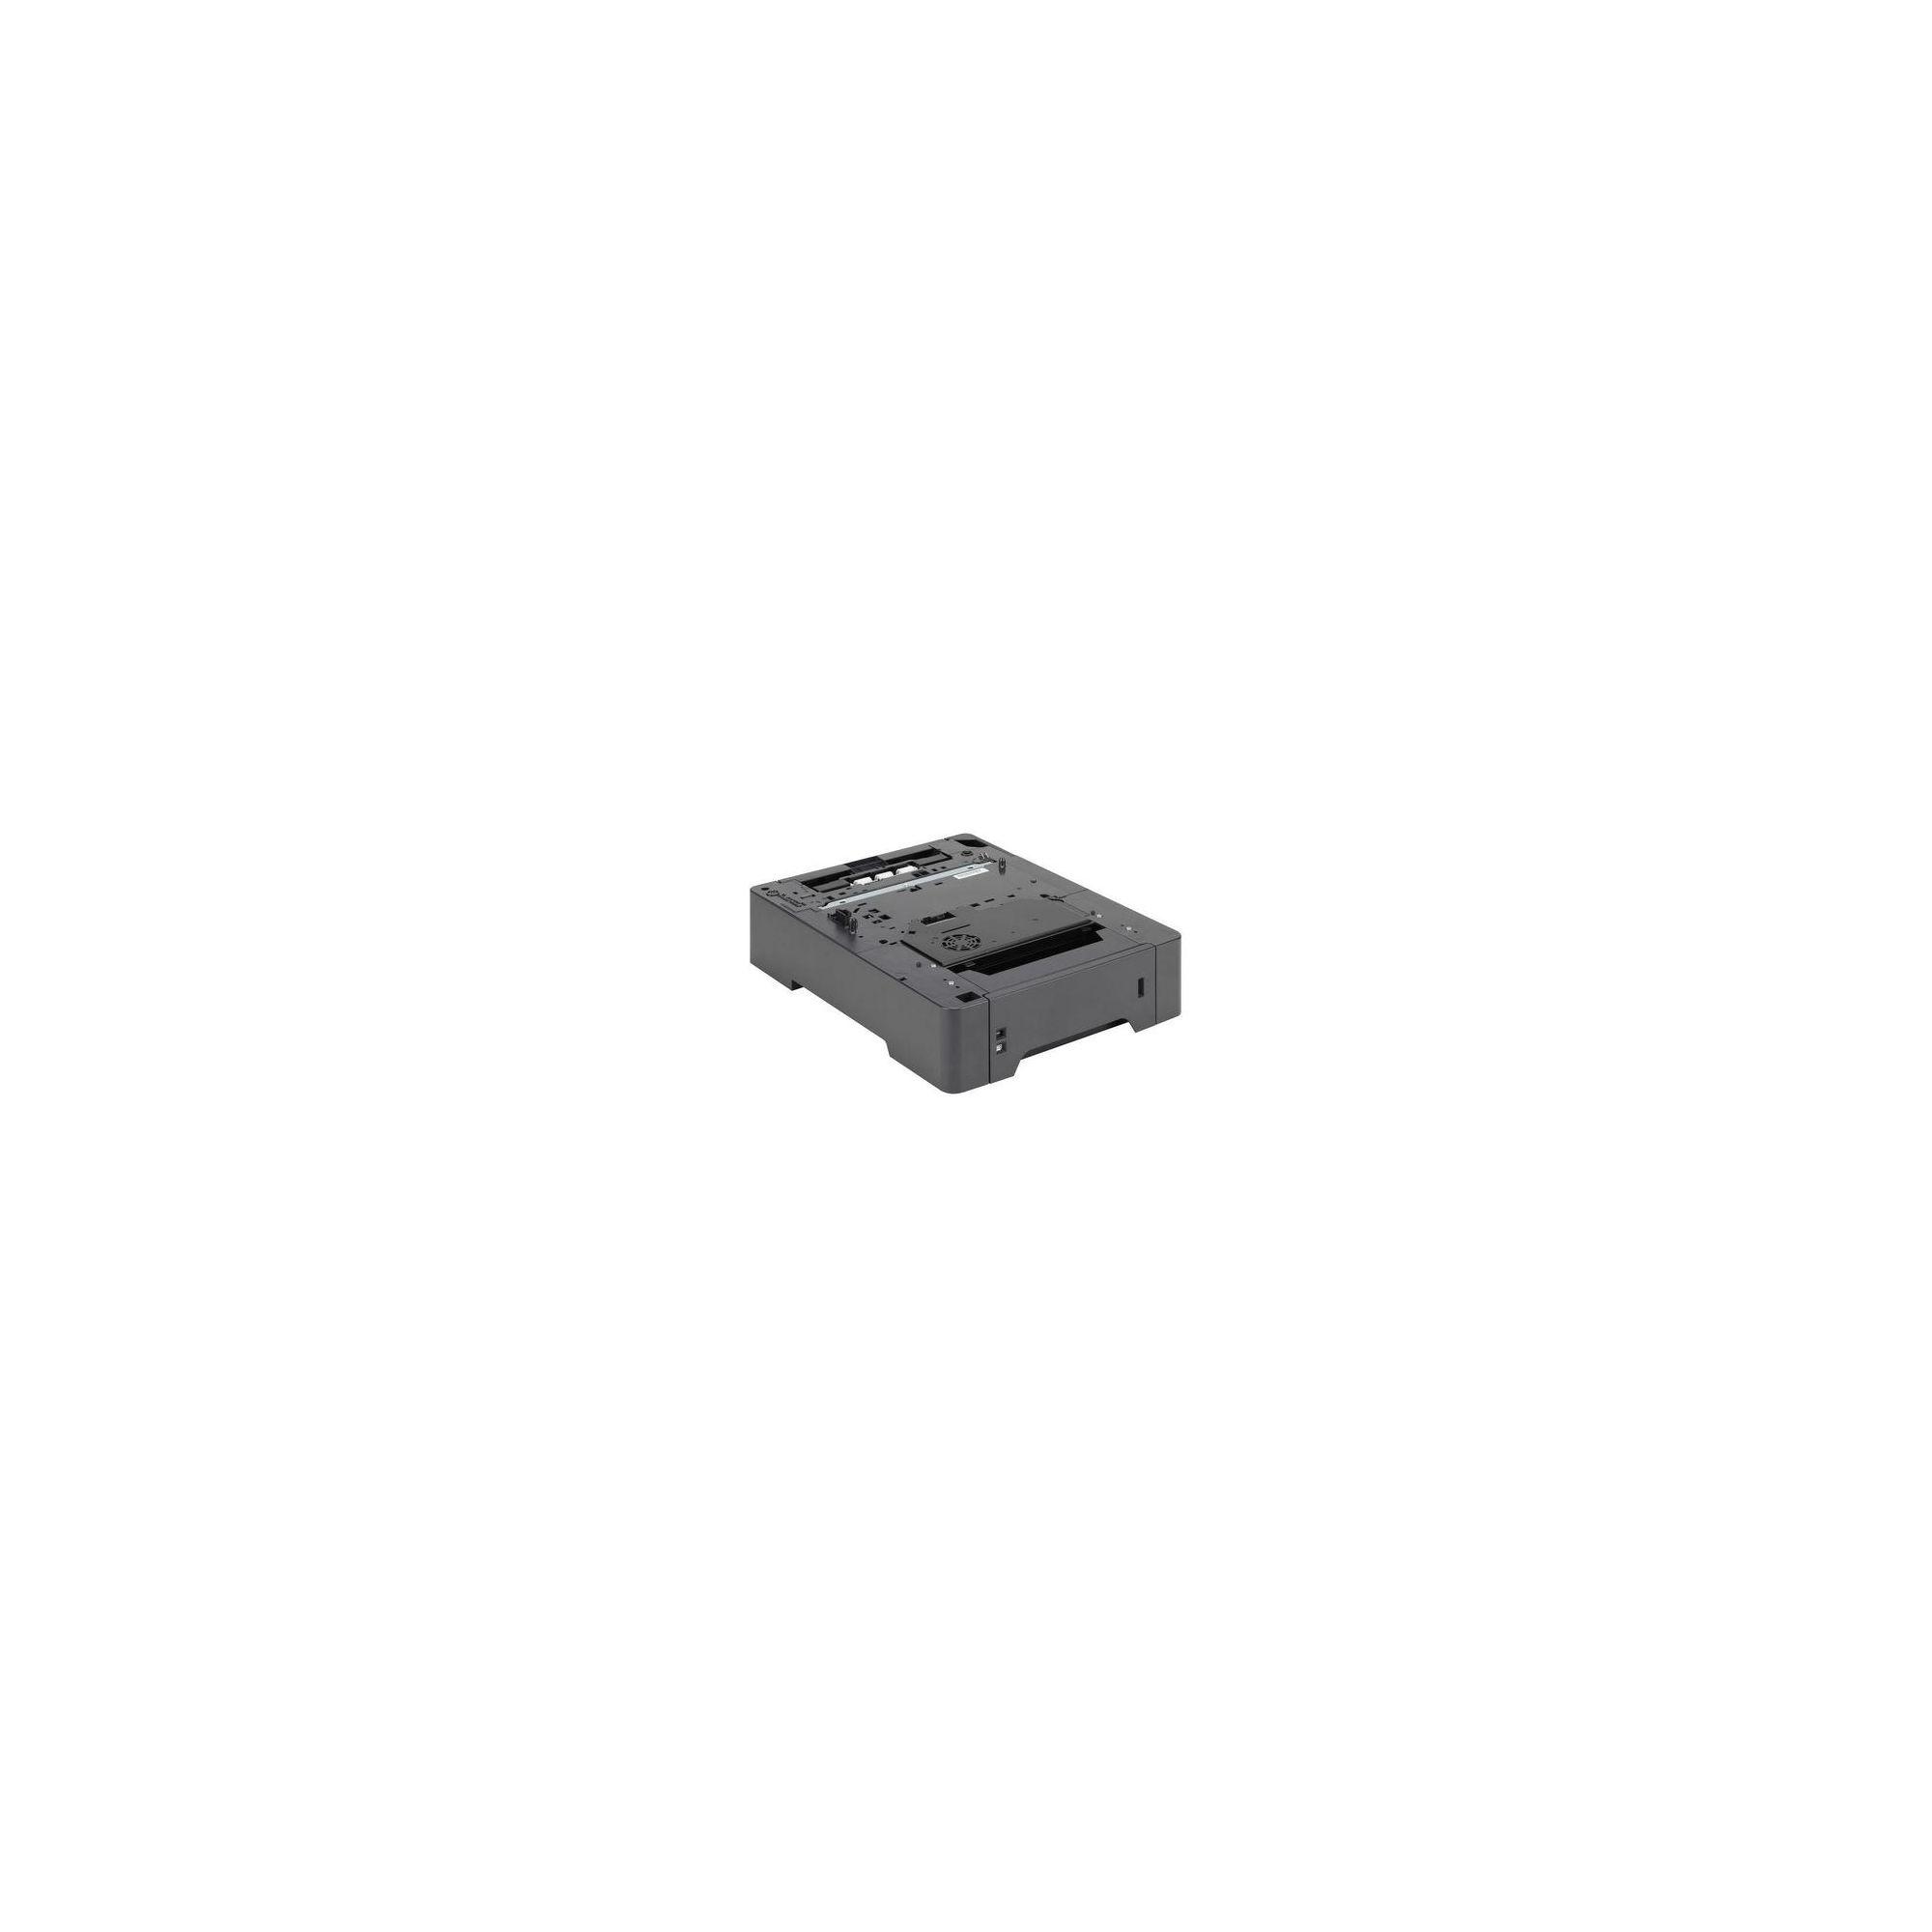 Kyocera 500 Sheet Feeder at Tesco Direct